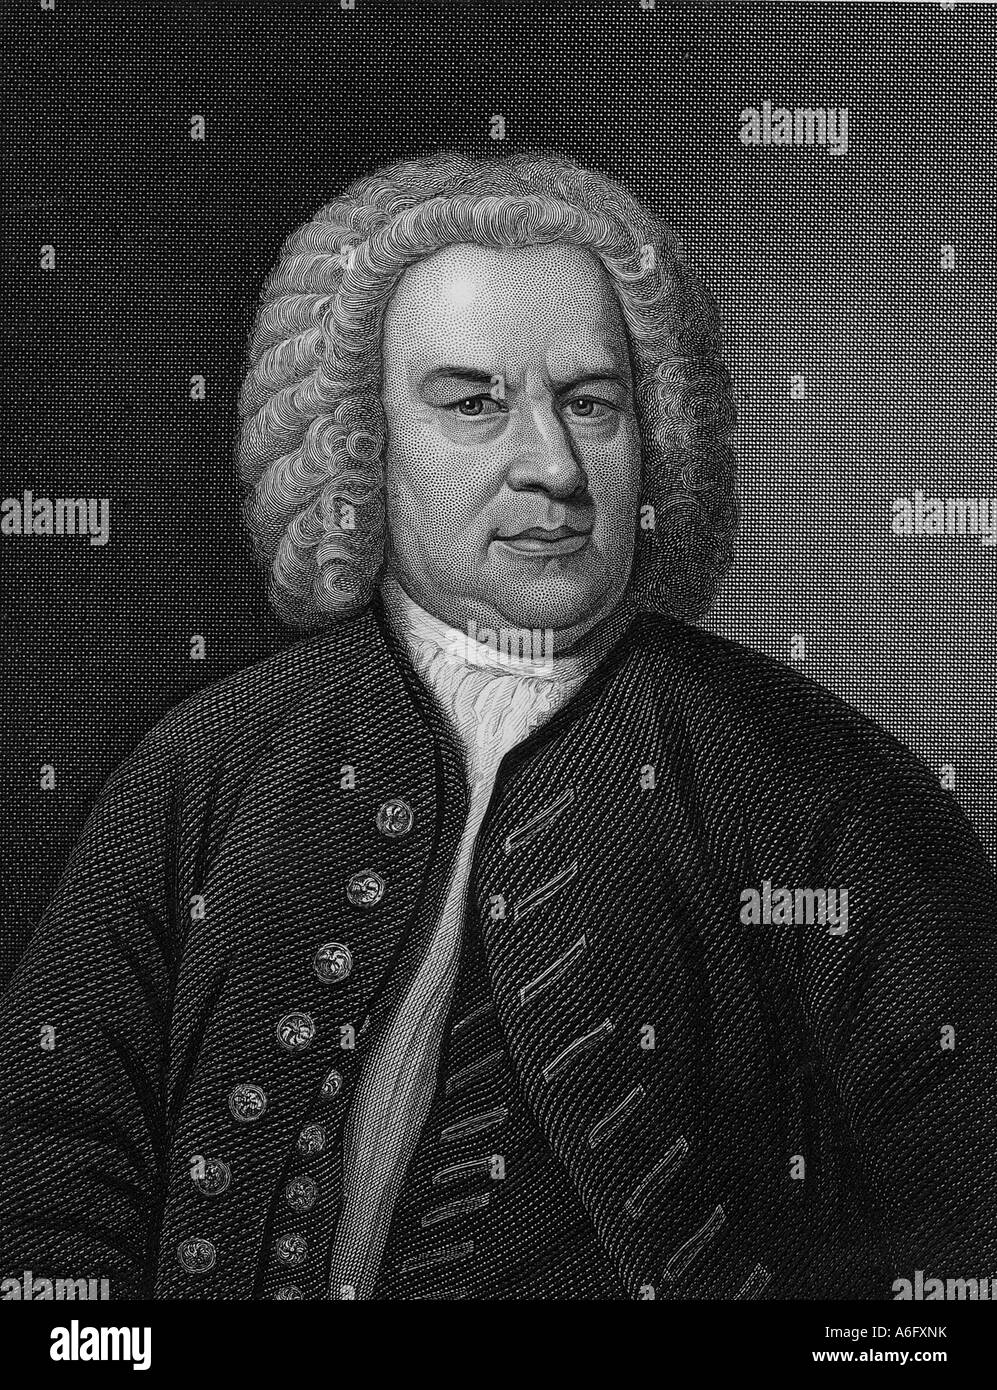 JOHANN SEBASTIAN BACH  German composer 1685 to 1750 - Stock Image